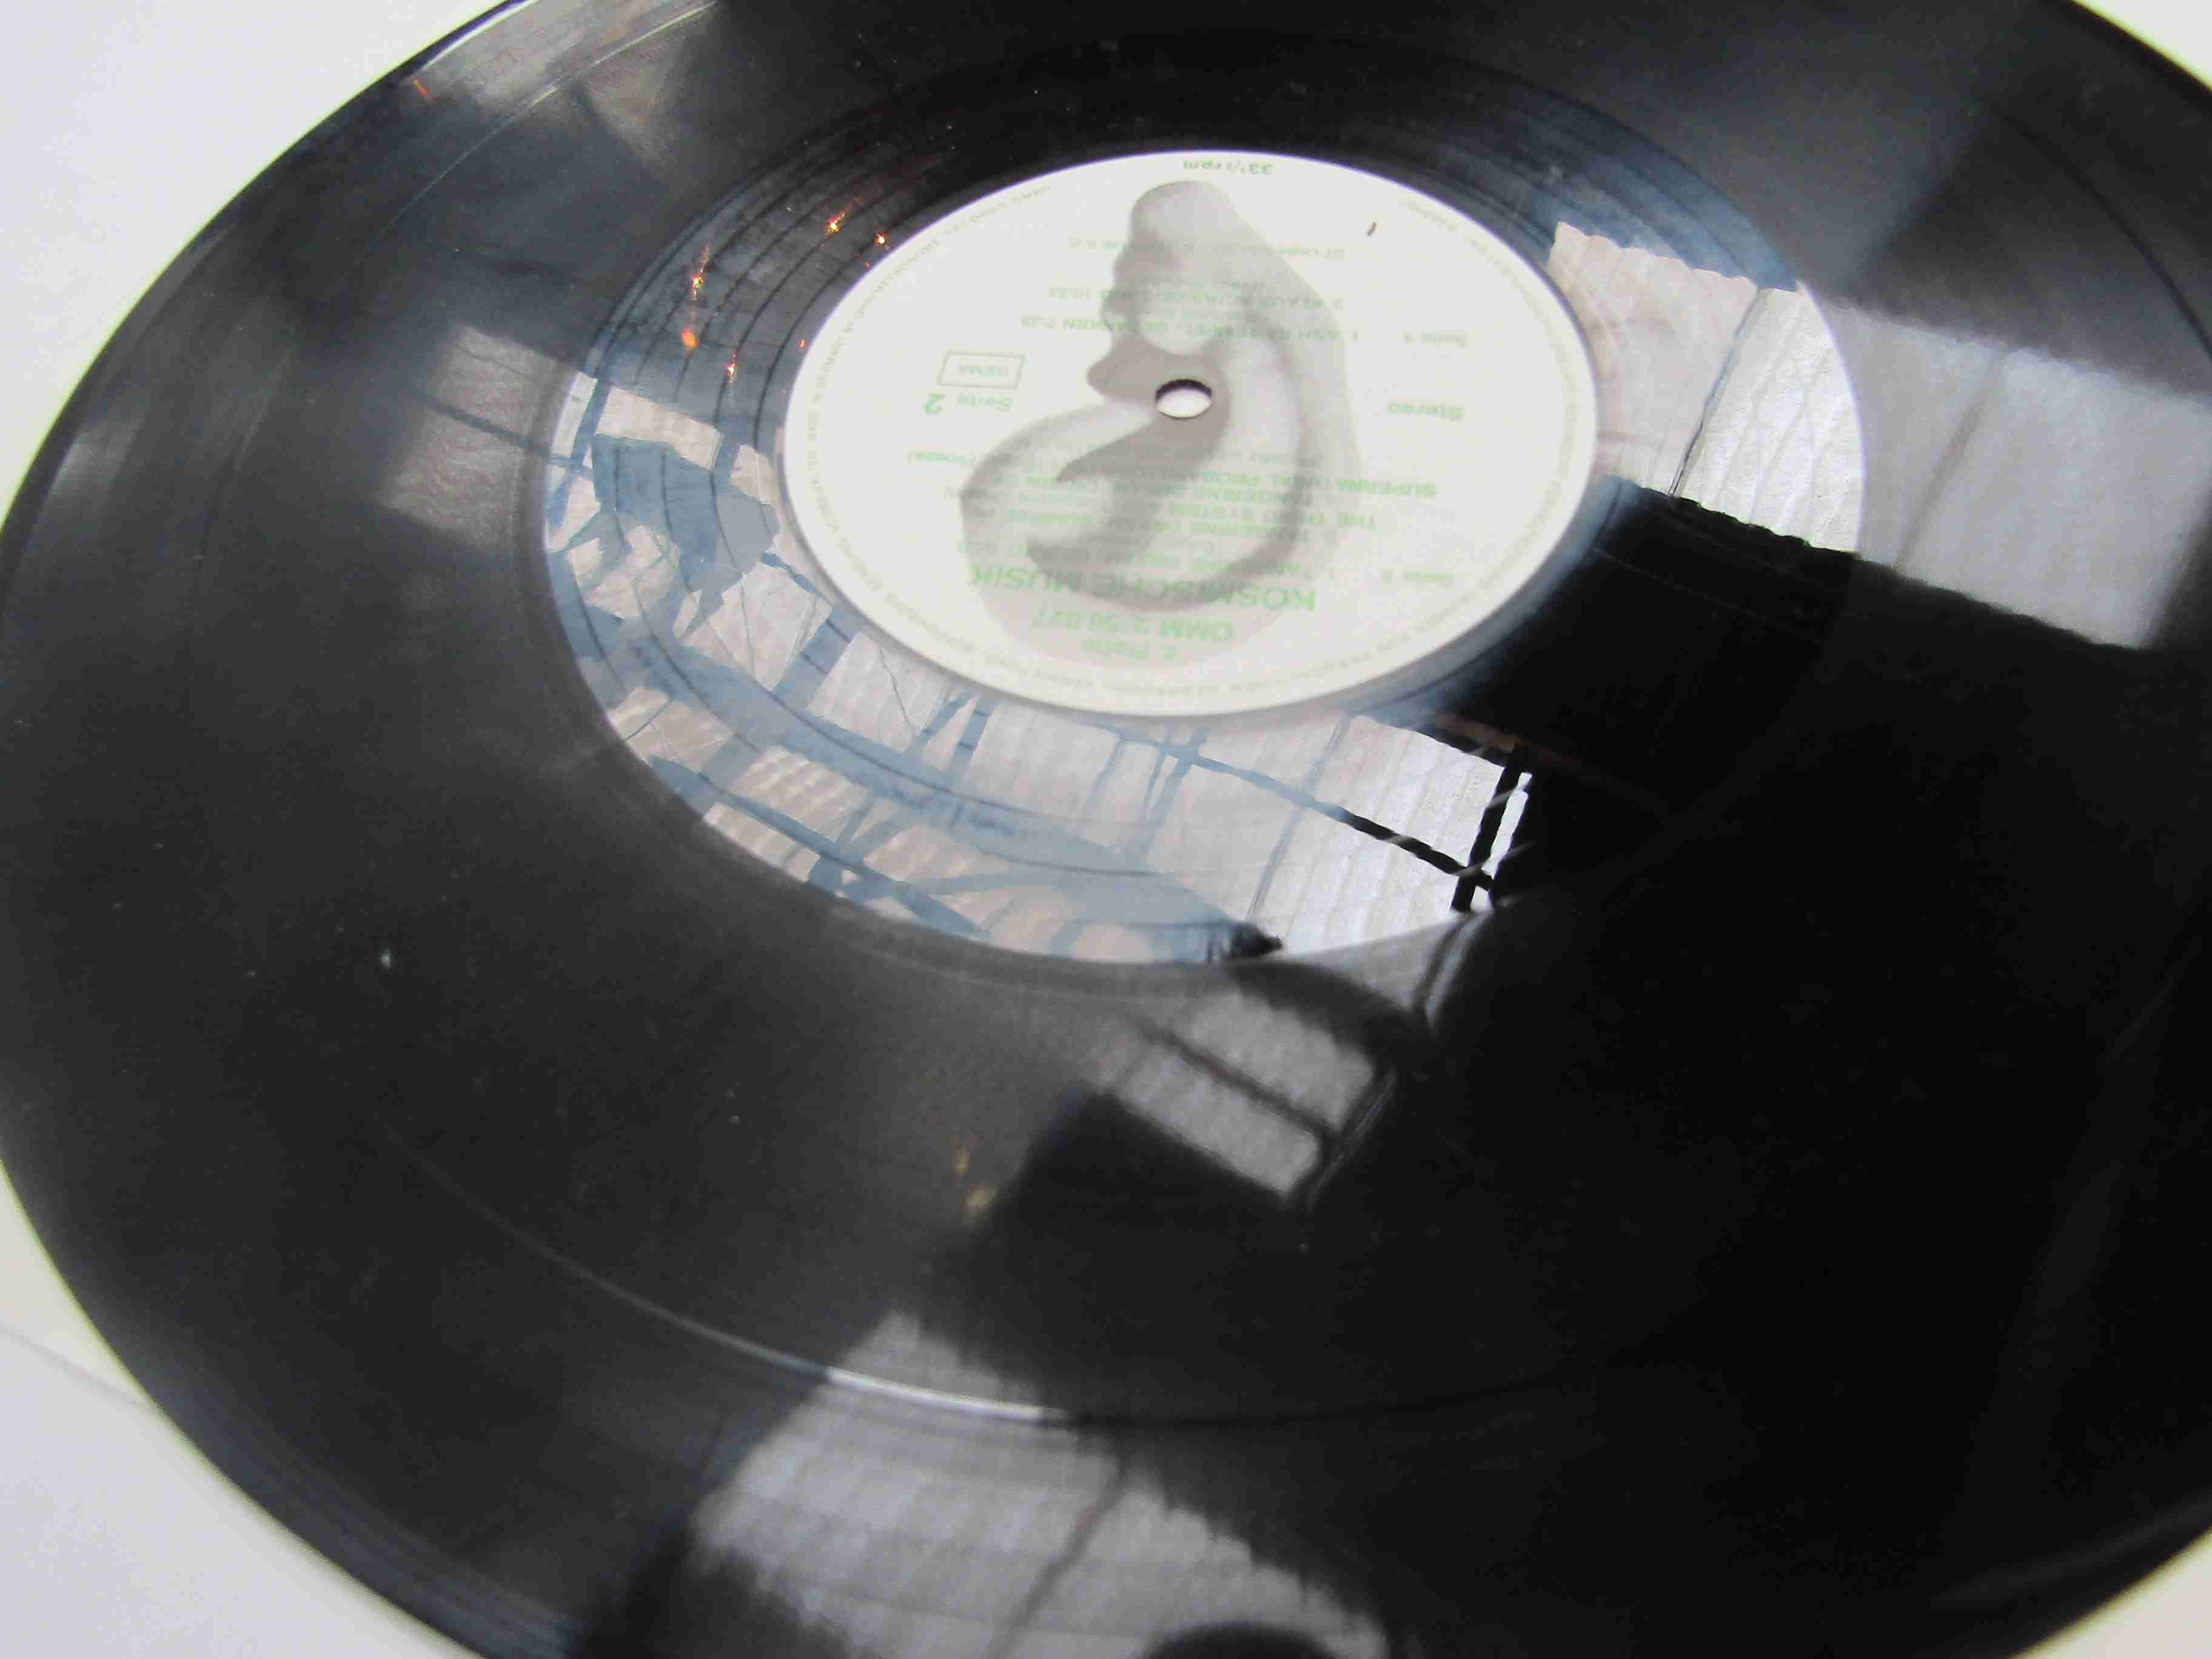 'Komische Musik' 2xLP Krautrock compilation featuring Popol Vuh, Klaus Schulze, Ash Ra, - Image 2 of 2